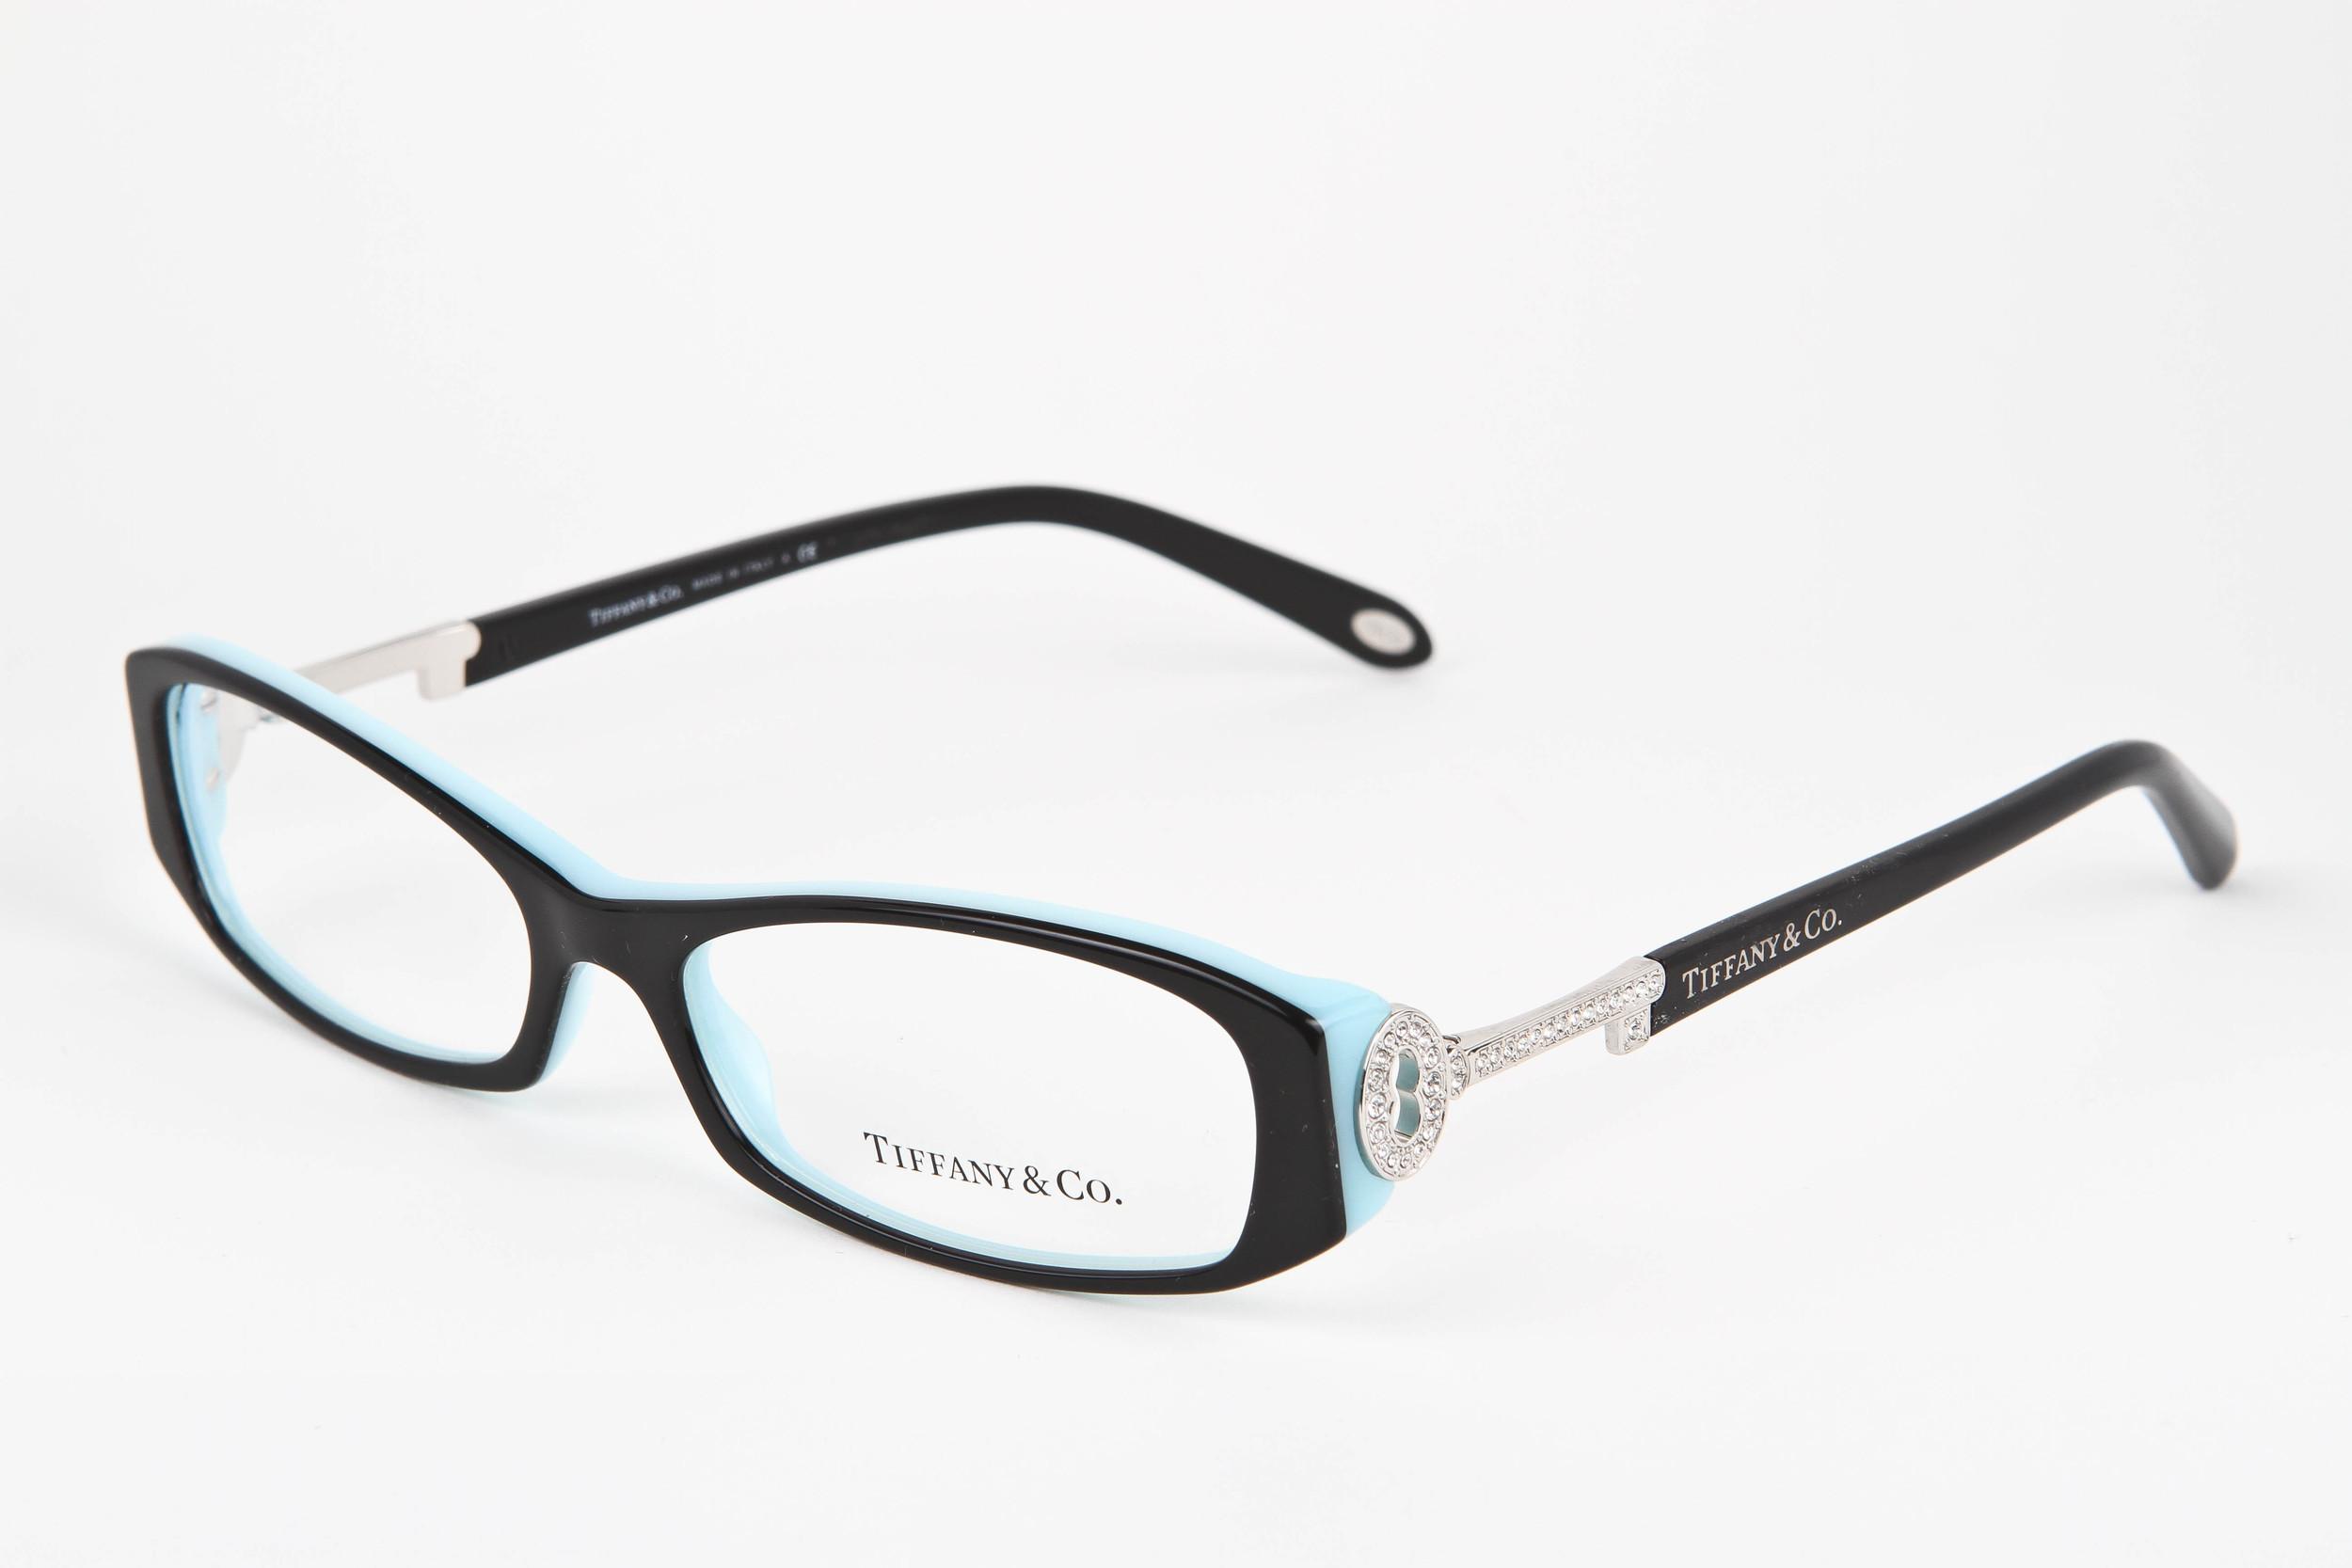 9a7f4fe847 Tiffany   Co. Black and Blue with Diamonds — BFOCUS-EYEWEAR